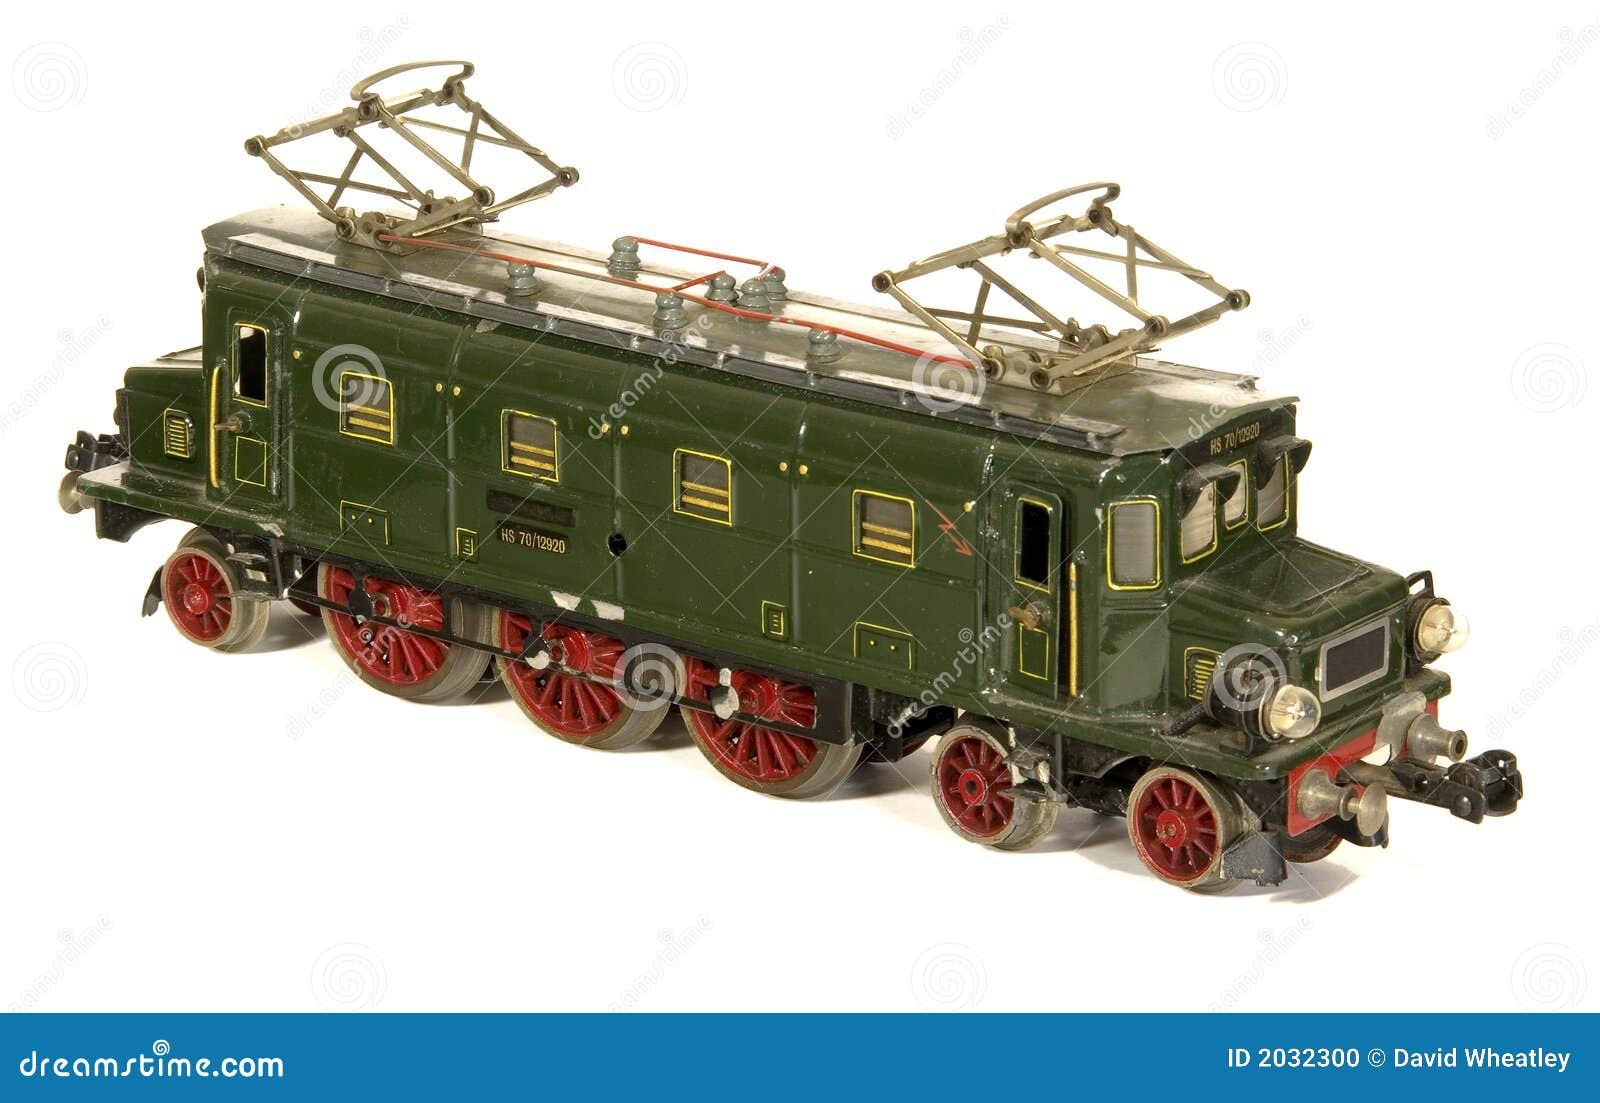 1930s marklin trains greece